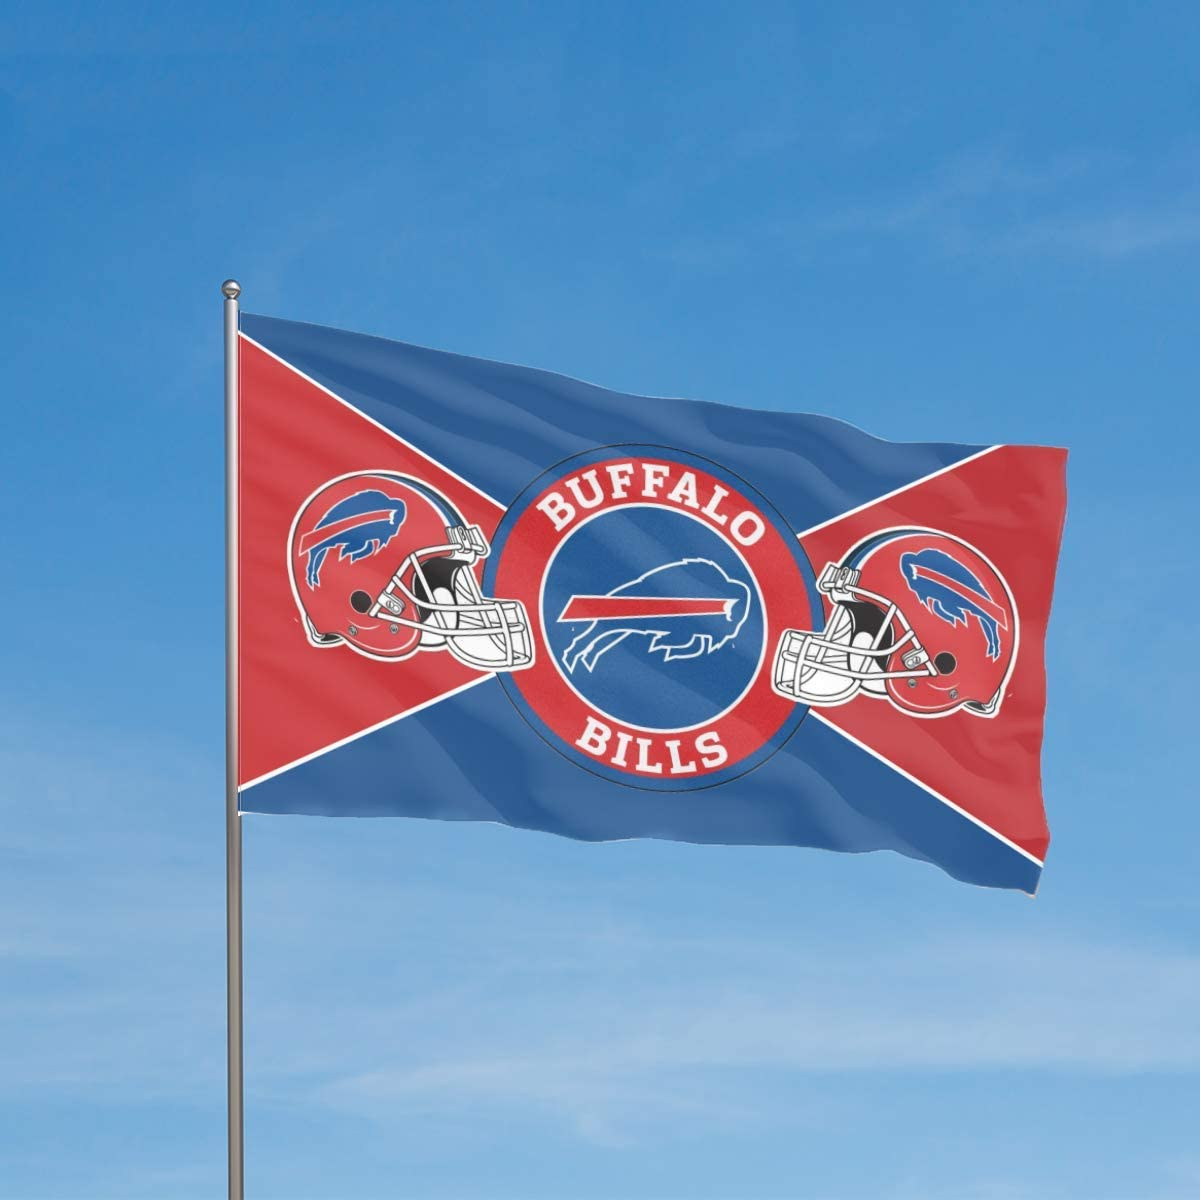 Stockdale Buffalo Bills Flag Champion Outdoor Decor Banner 3 x 5 FT